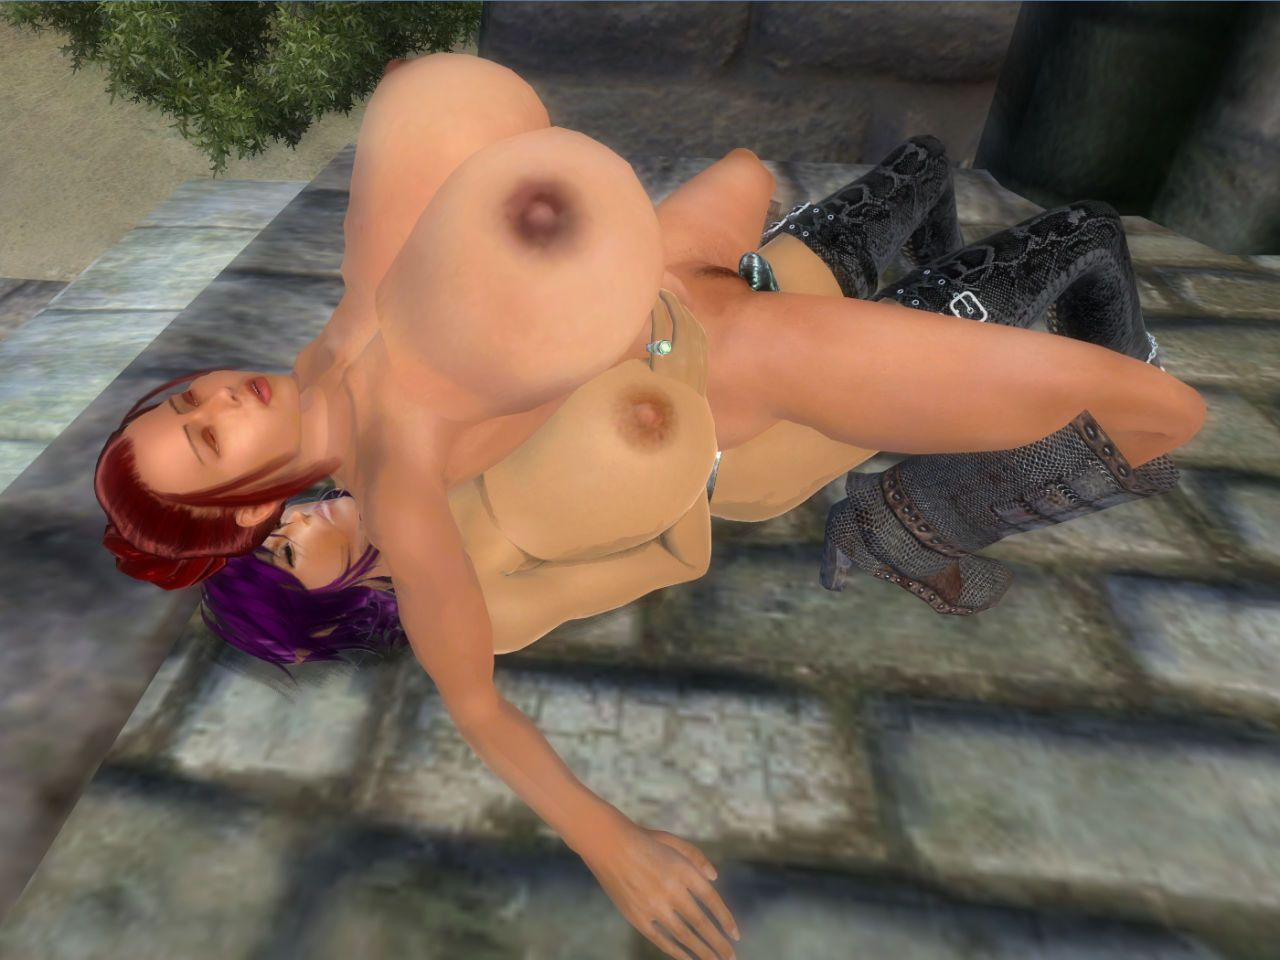 [Chaisy] Oblivion Strap-on Sex (The Elder Scrolls: Oblivion) - part 2